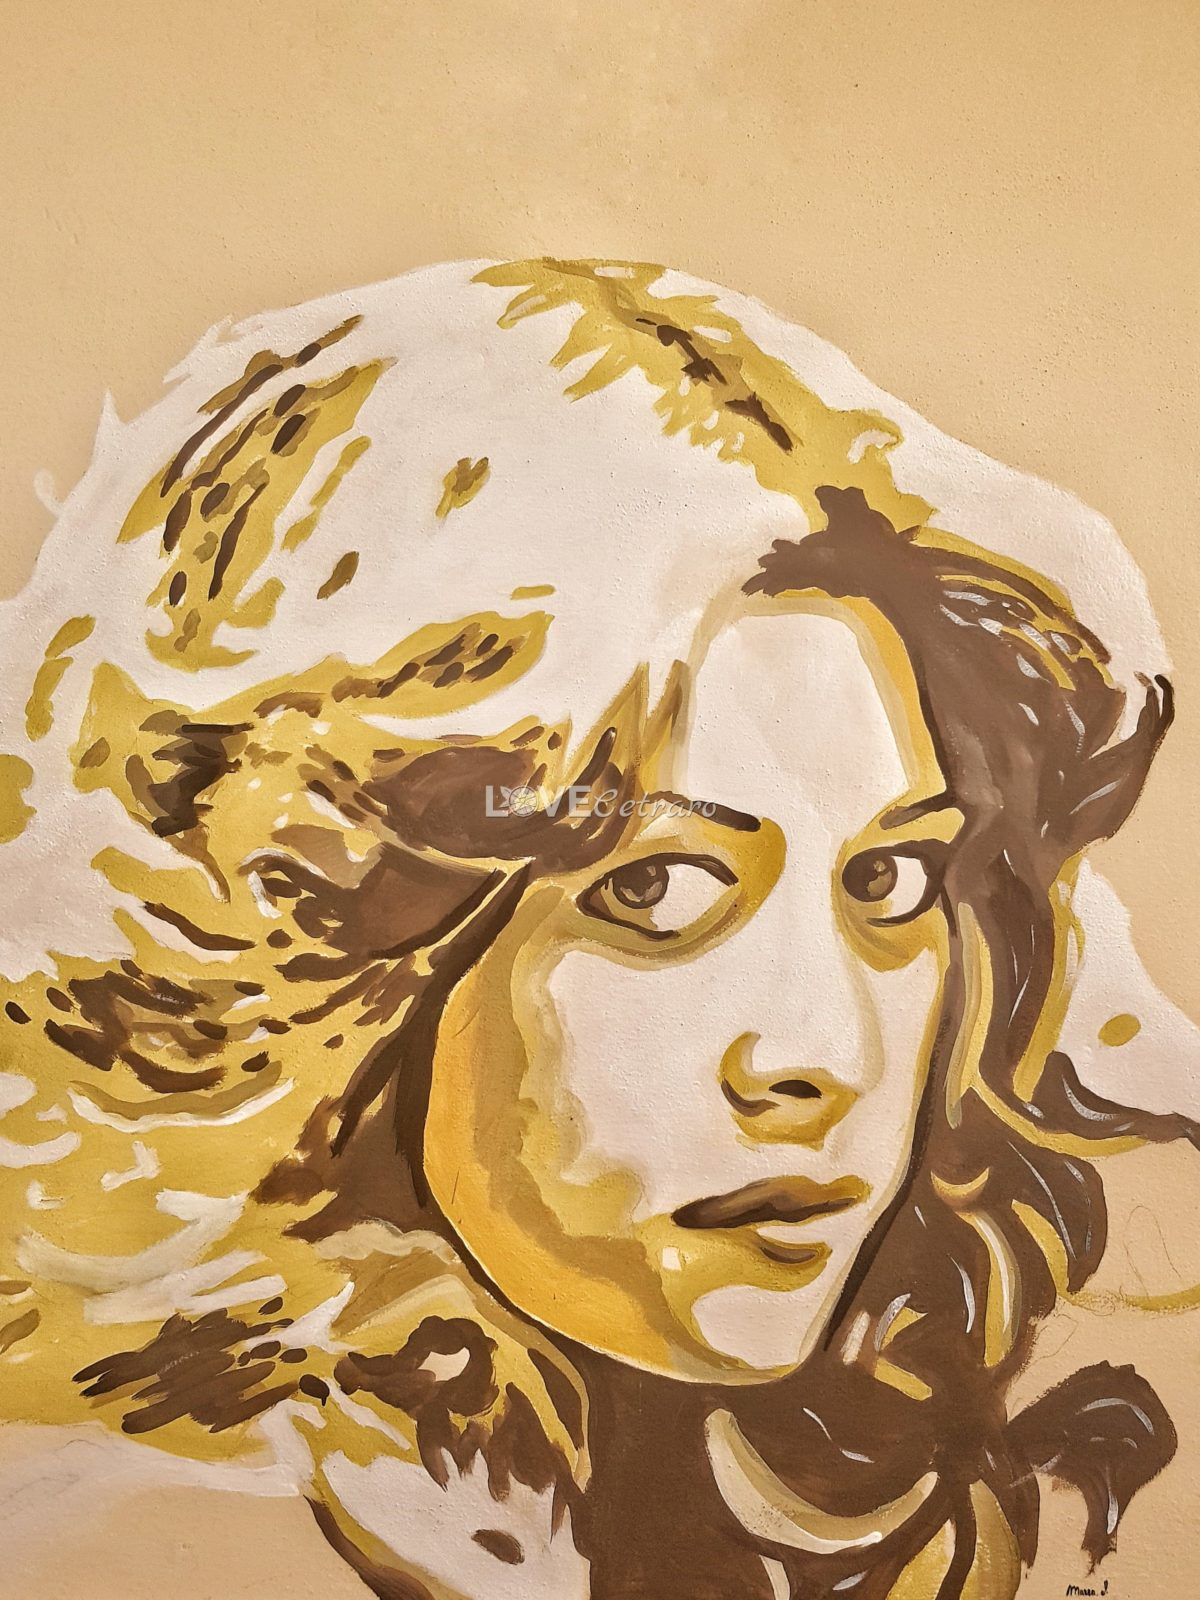 murales-diamante-calabria-street-art (67)